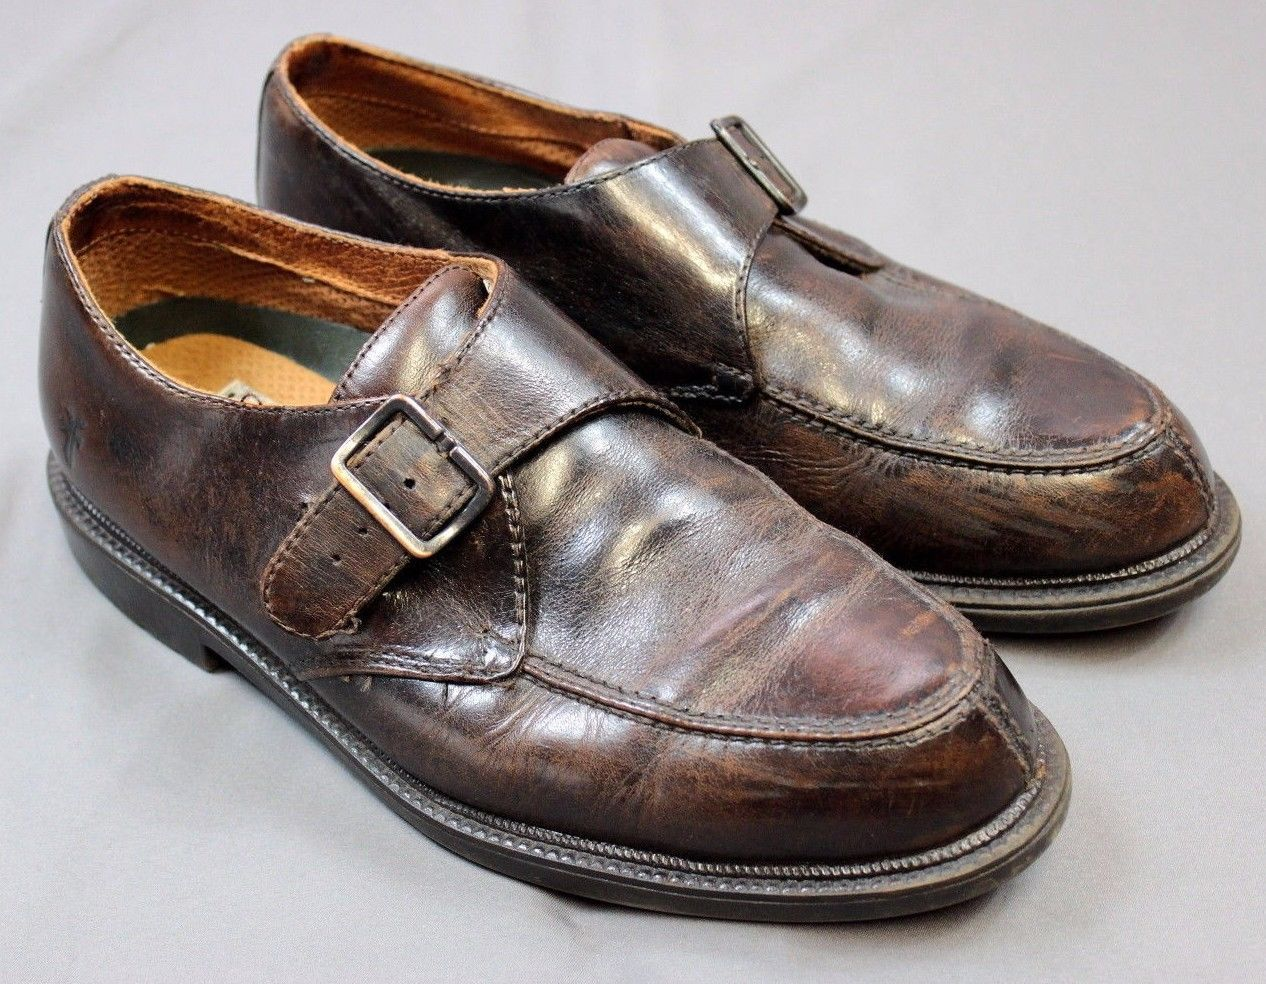 Frye James Wingtip Oxford 84619 Men Shoes NEW Size US 7  10.5